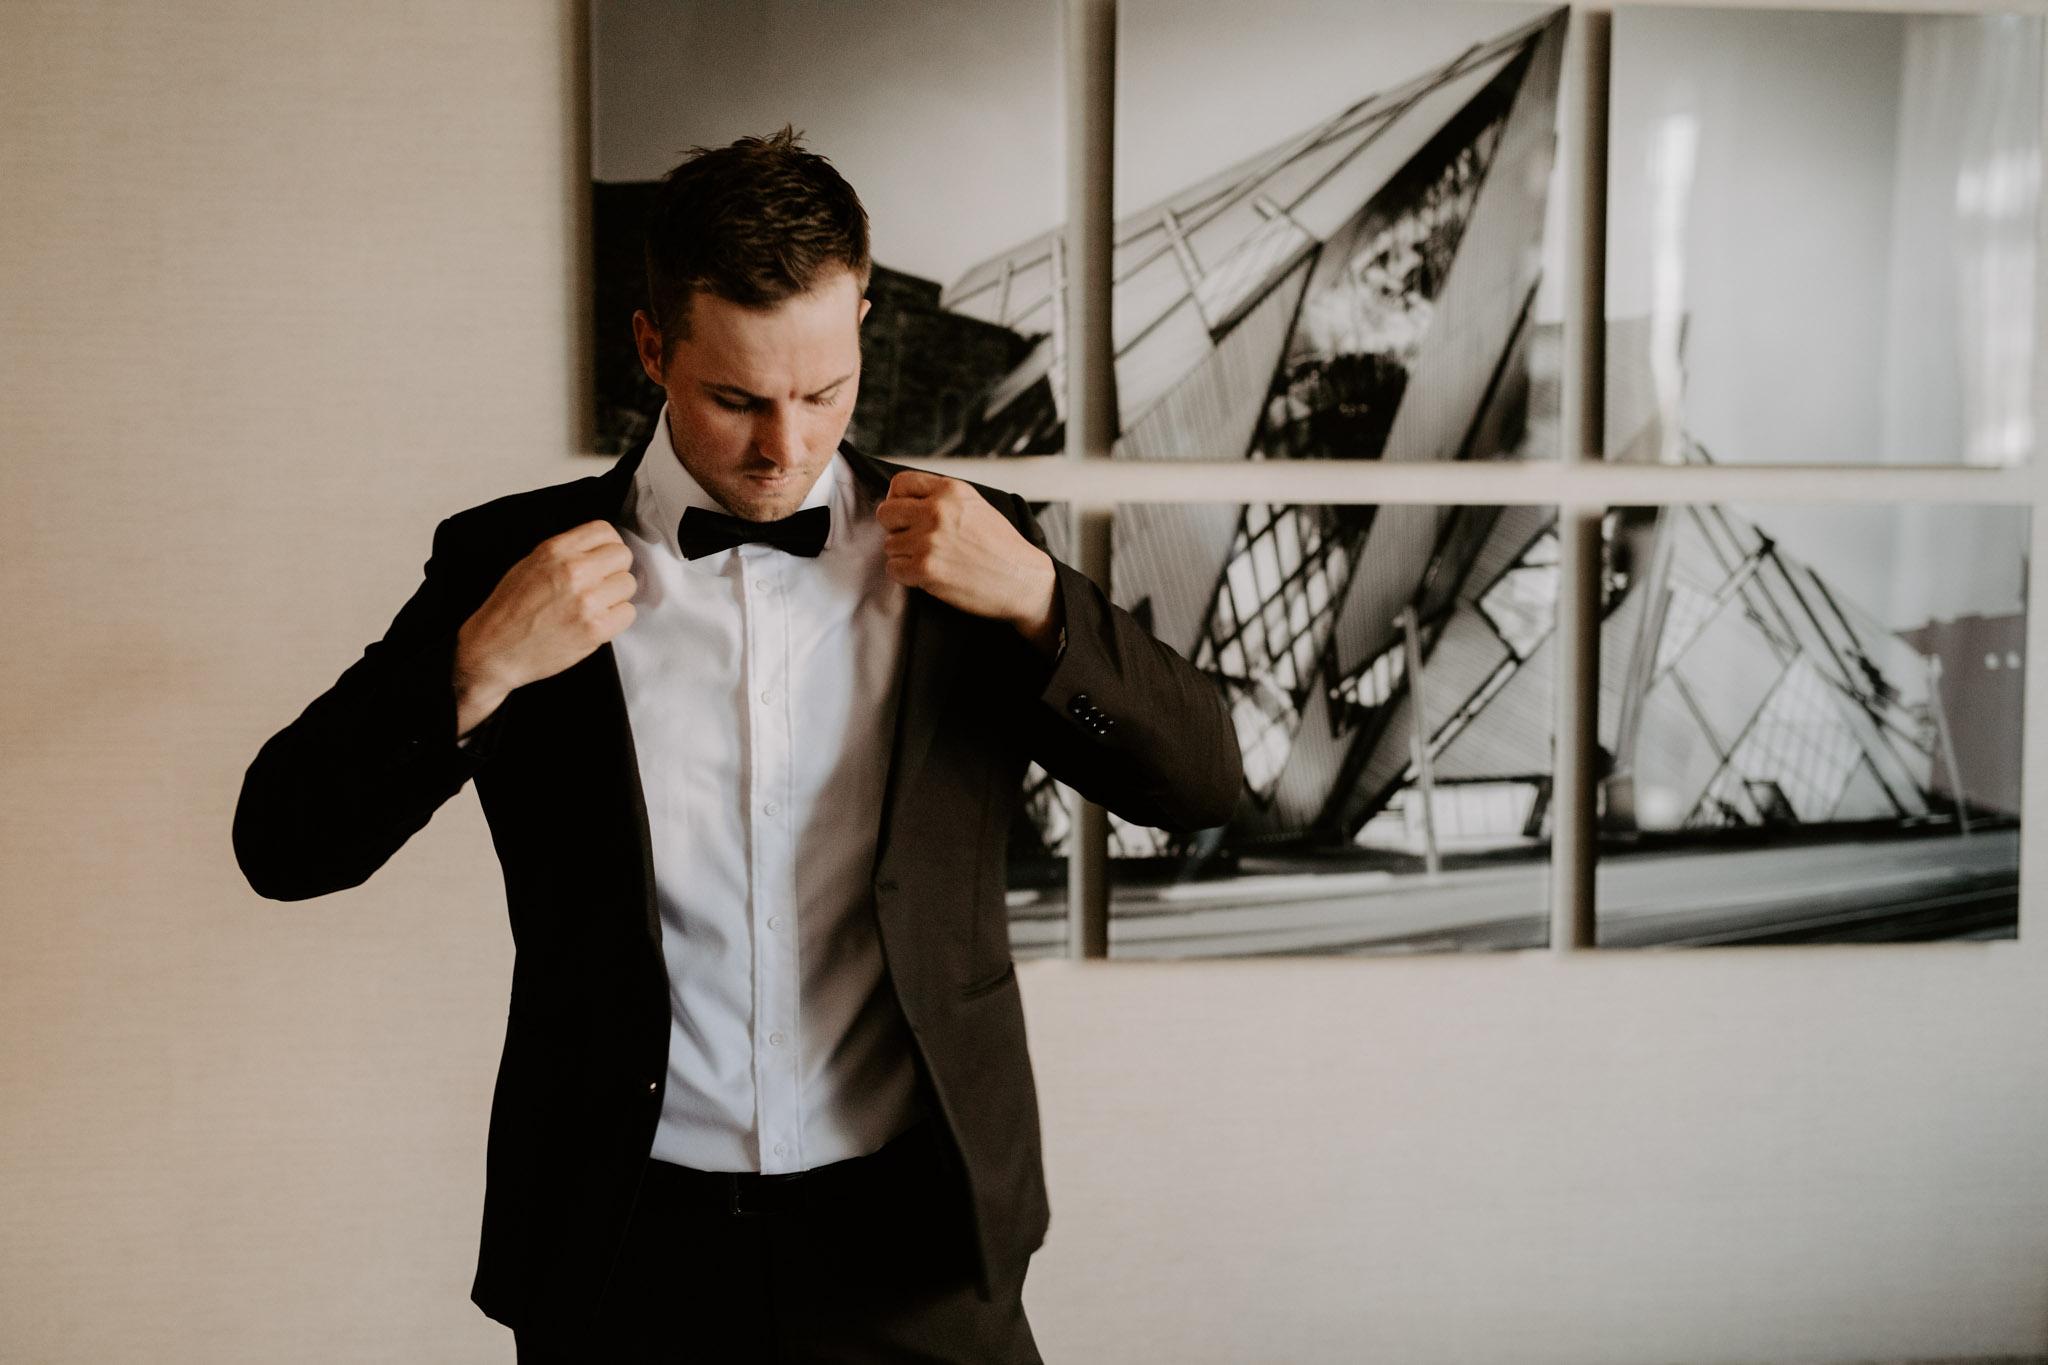 Liberty Village Wedding - groom putting on jacket